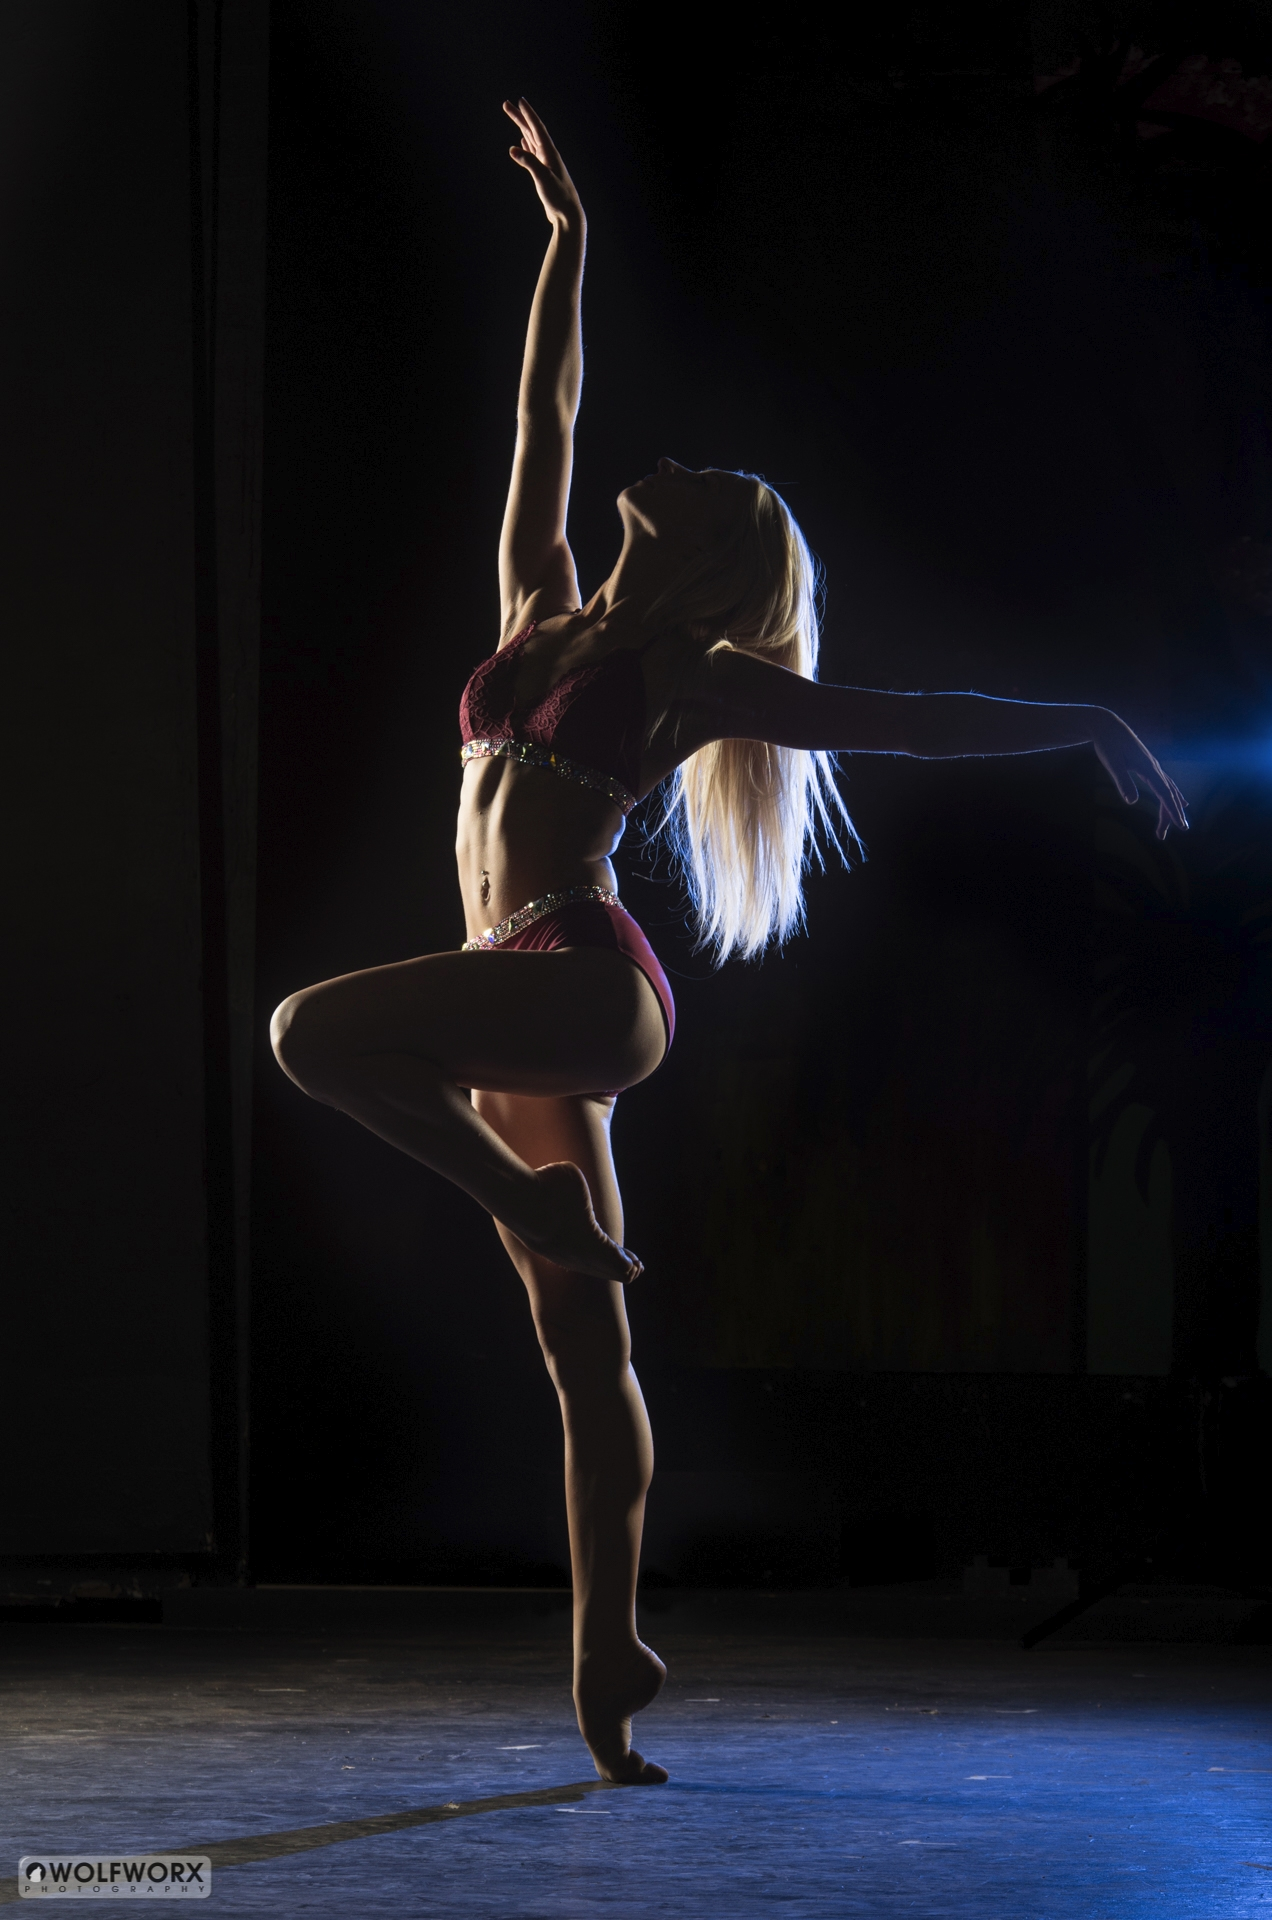 Backlit dancer - dance, photography - wolfworx_photography | ello